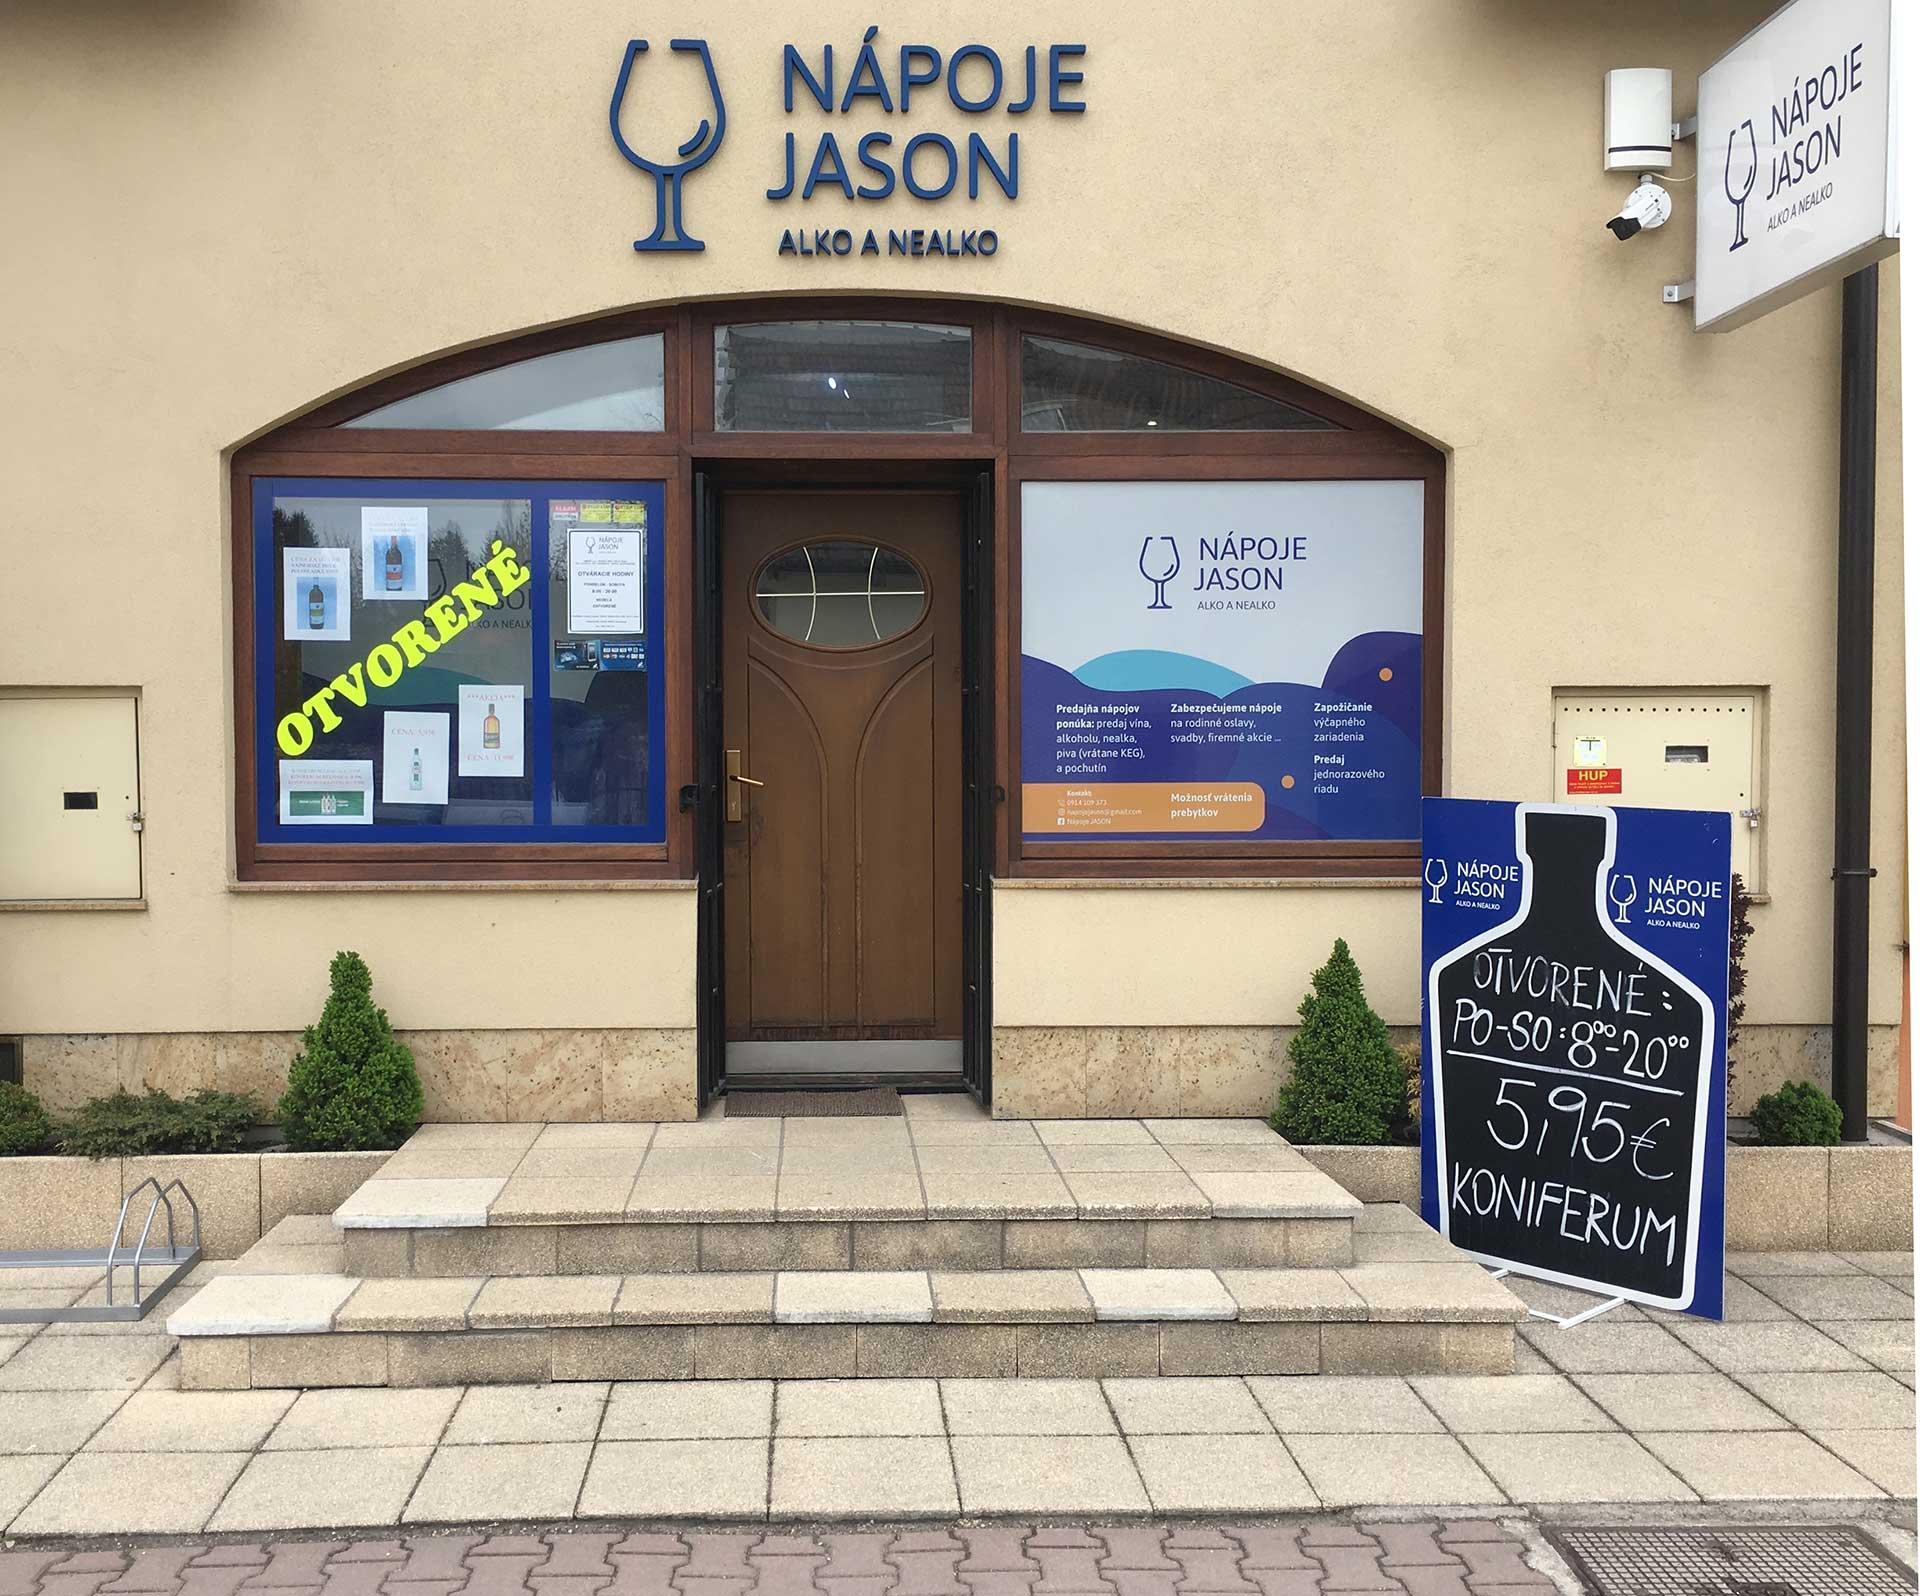 Nápoje Jason - Alko & Nealko - pobočka Rajec